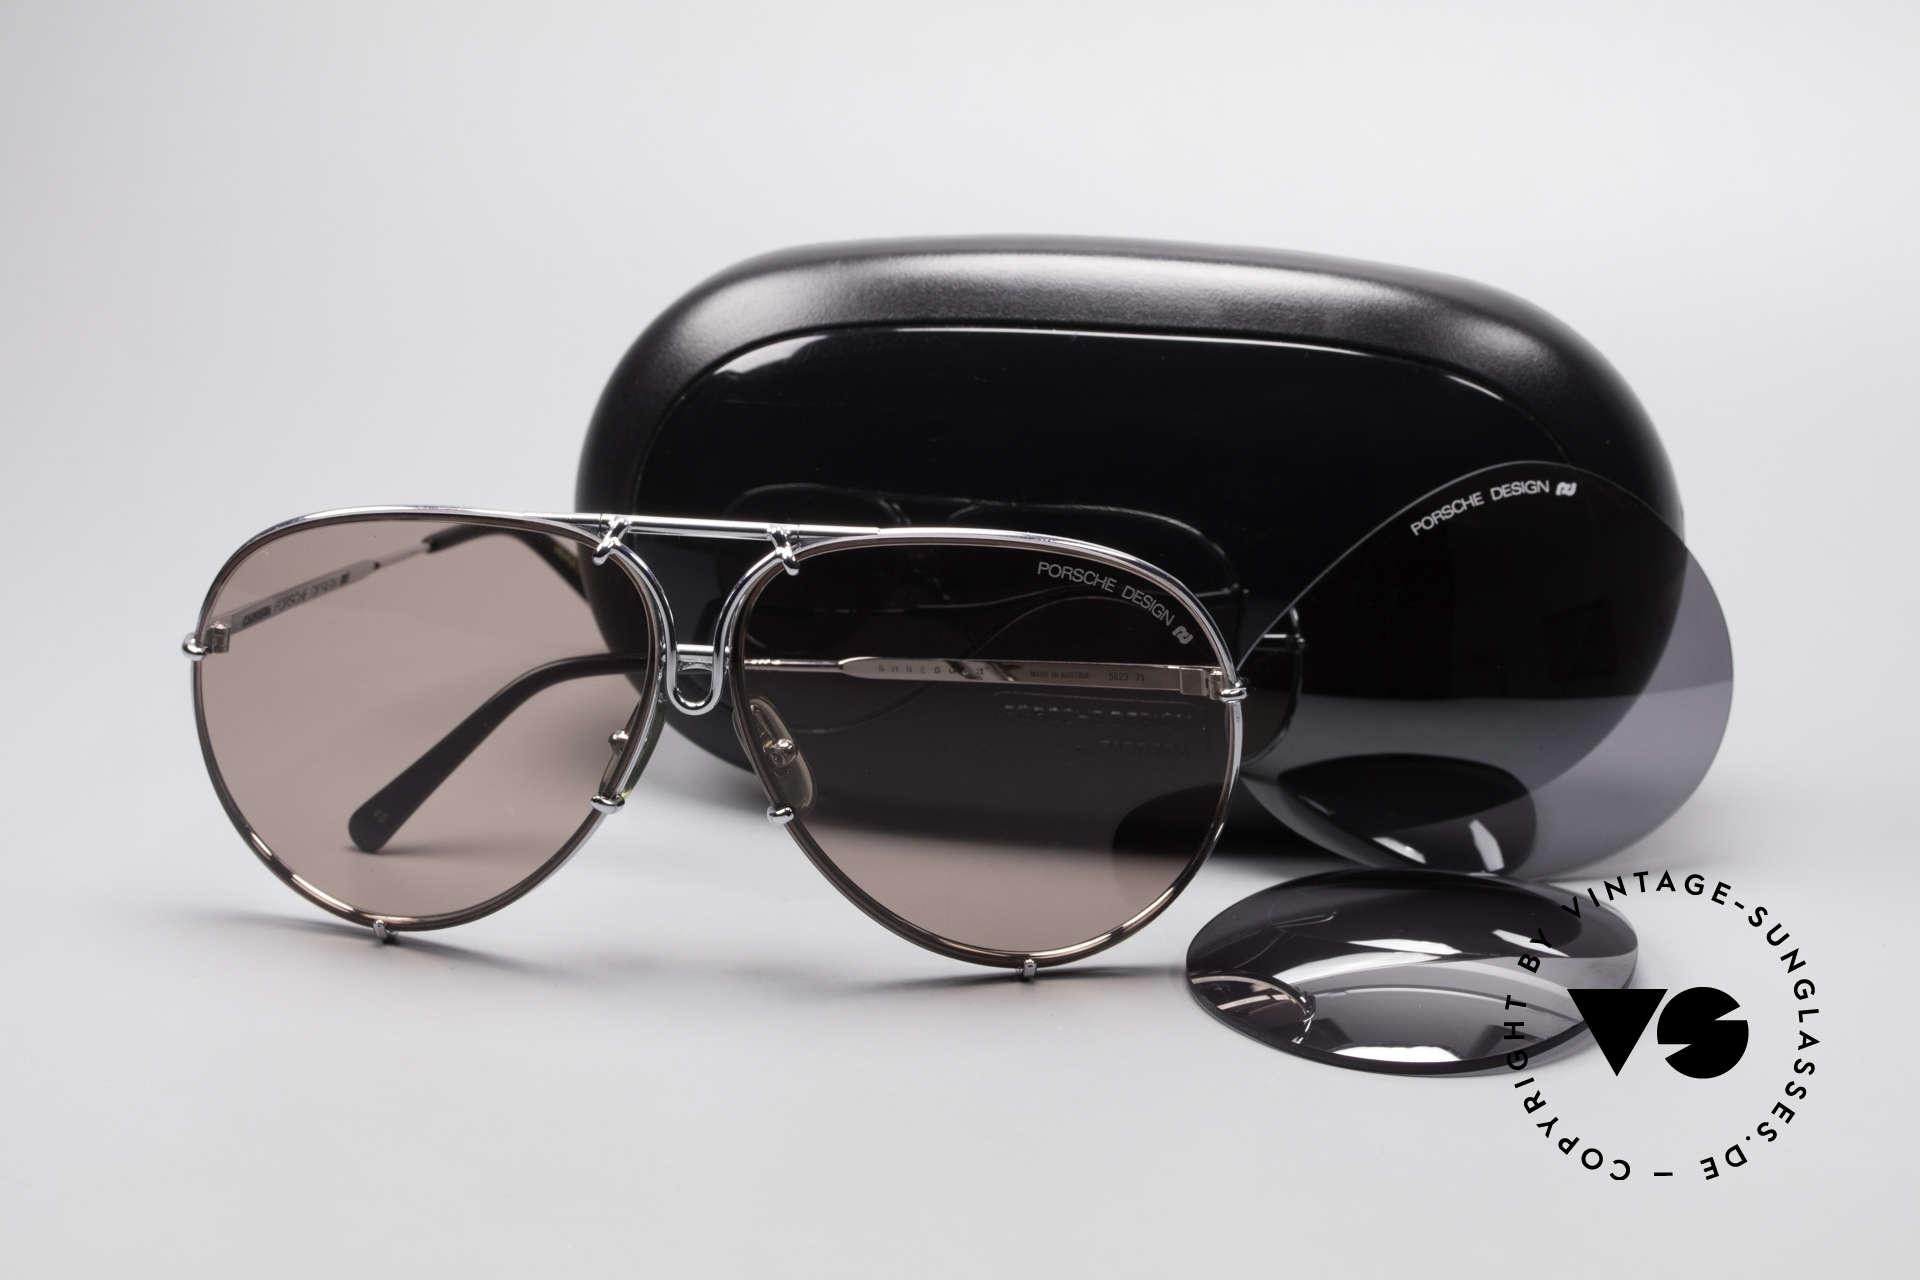 Porsche 5623 Silver Mirrored Sun Lenses, NO RETRO SUNGLASSES, but a 30 years old original, Made for Men and Women